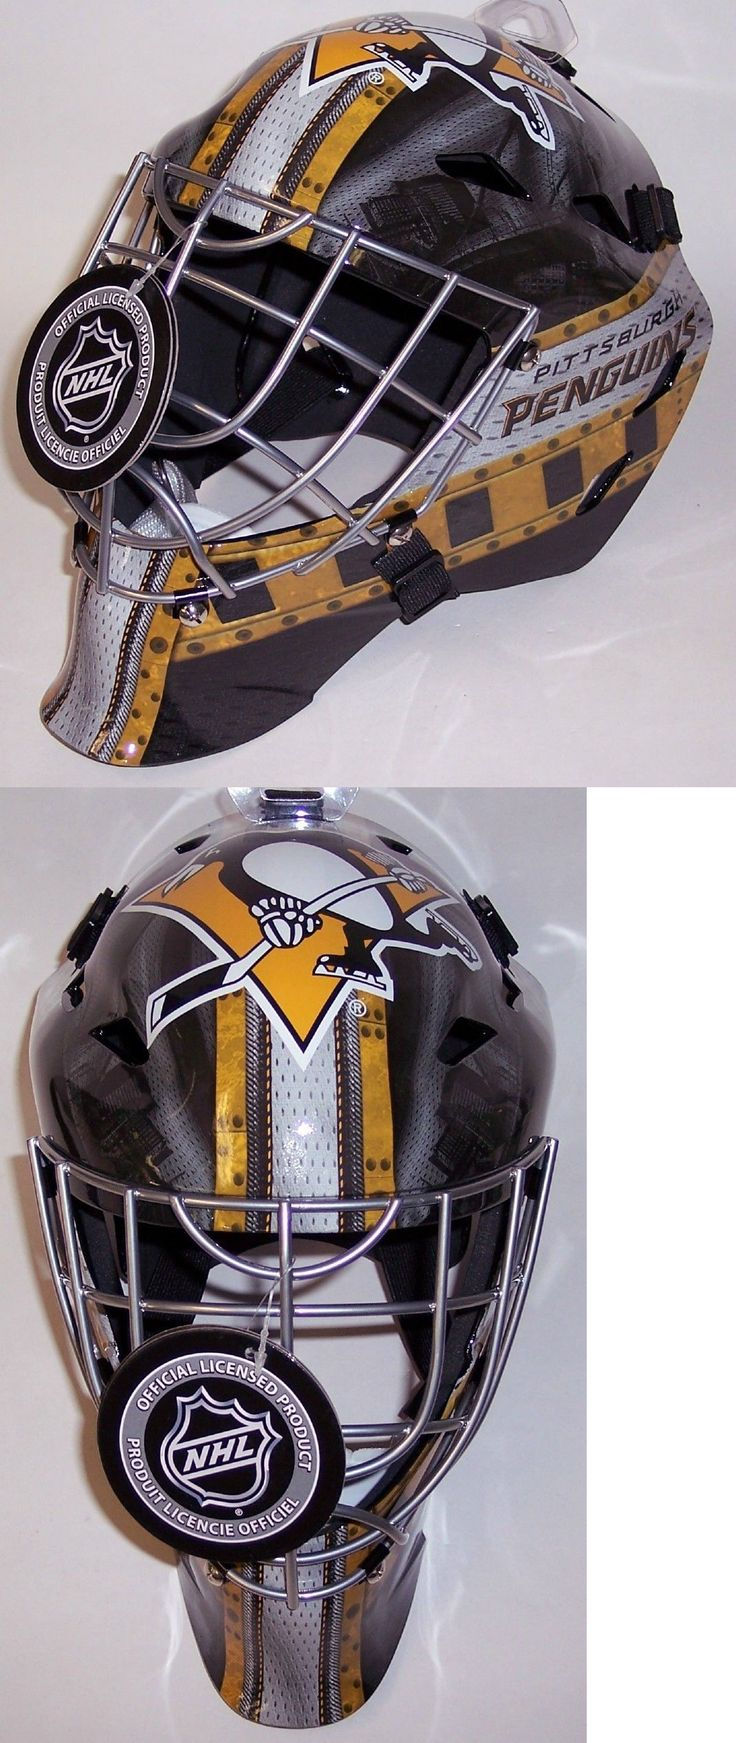 Hockey-NHL 24510: Pittsburgh Penguins Nhl Full Size Youth Goalie Hockey Mask ** New ** -> BUY IT NOW ONLY: $59.99 on eBay!